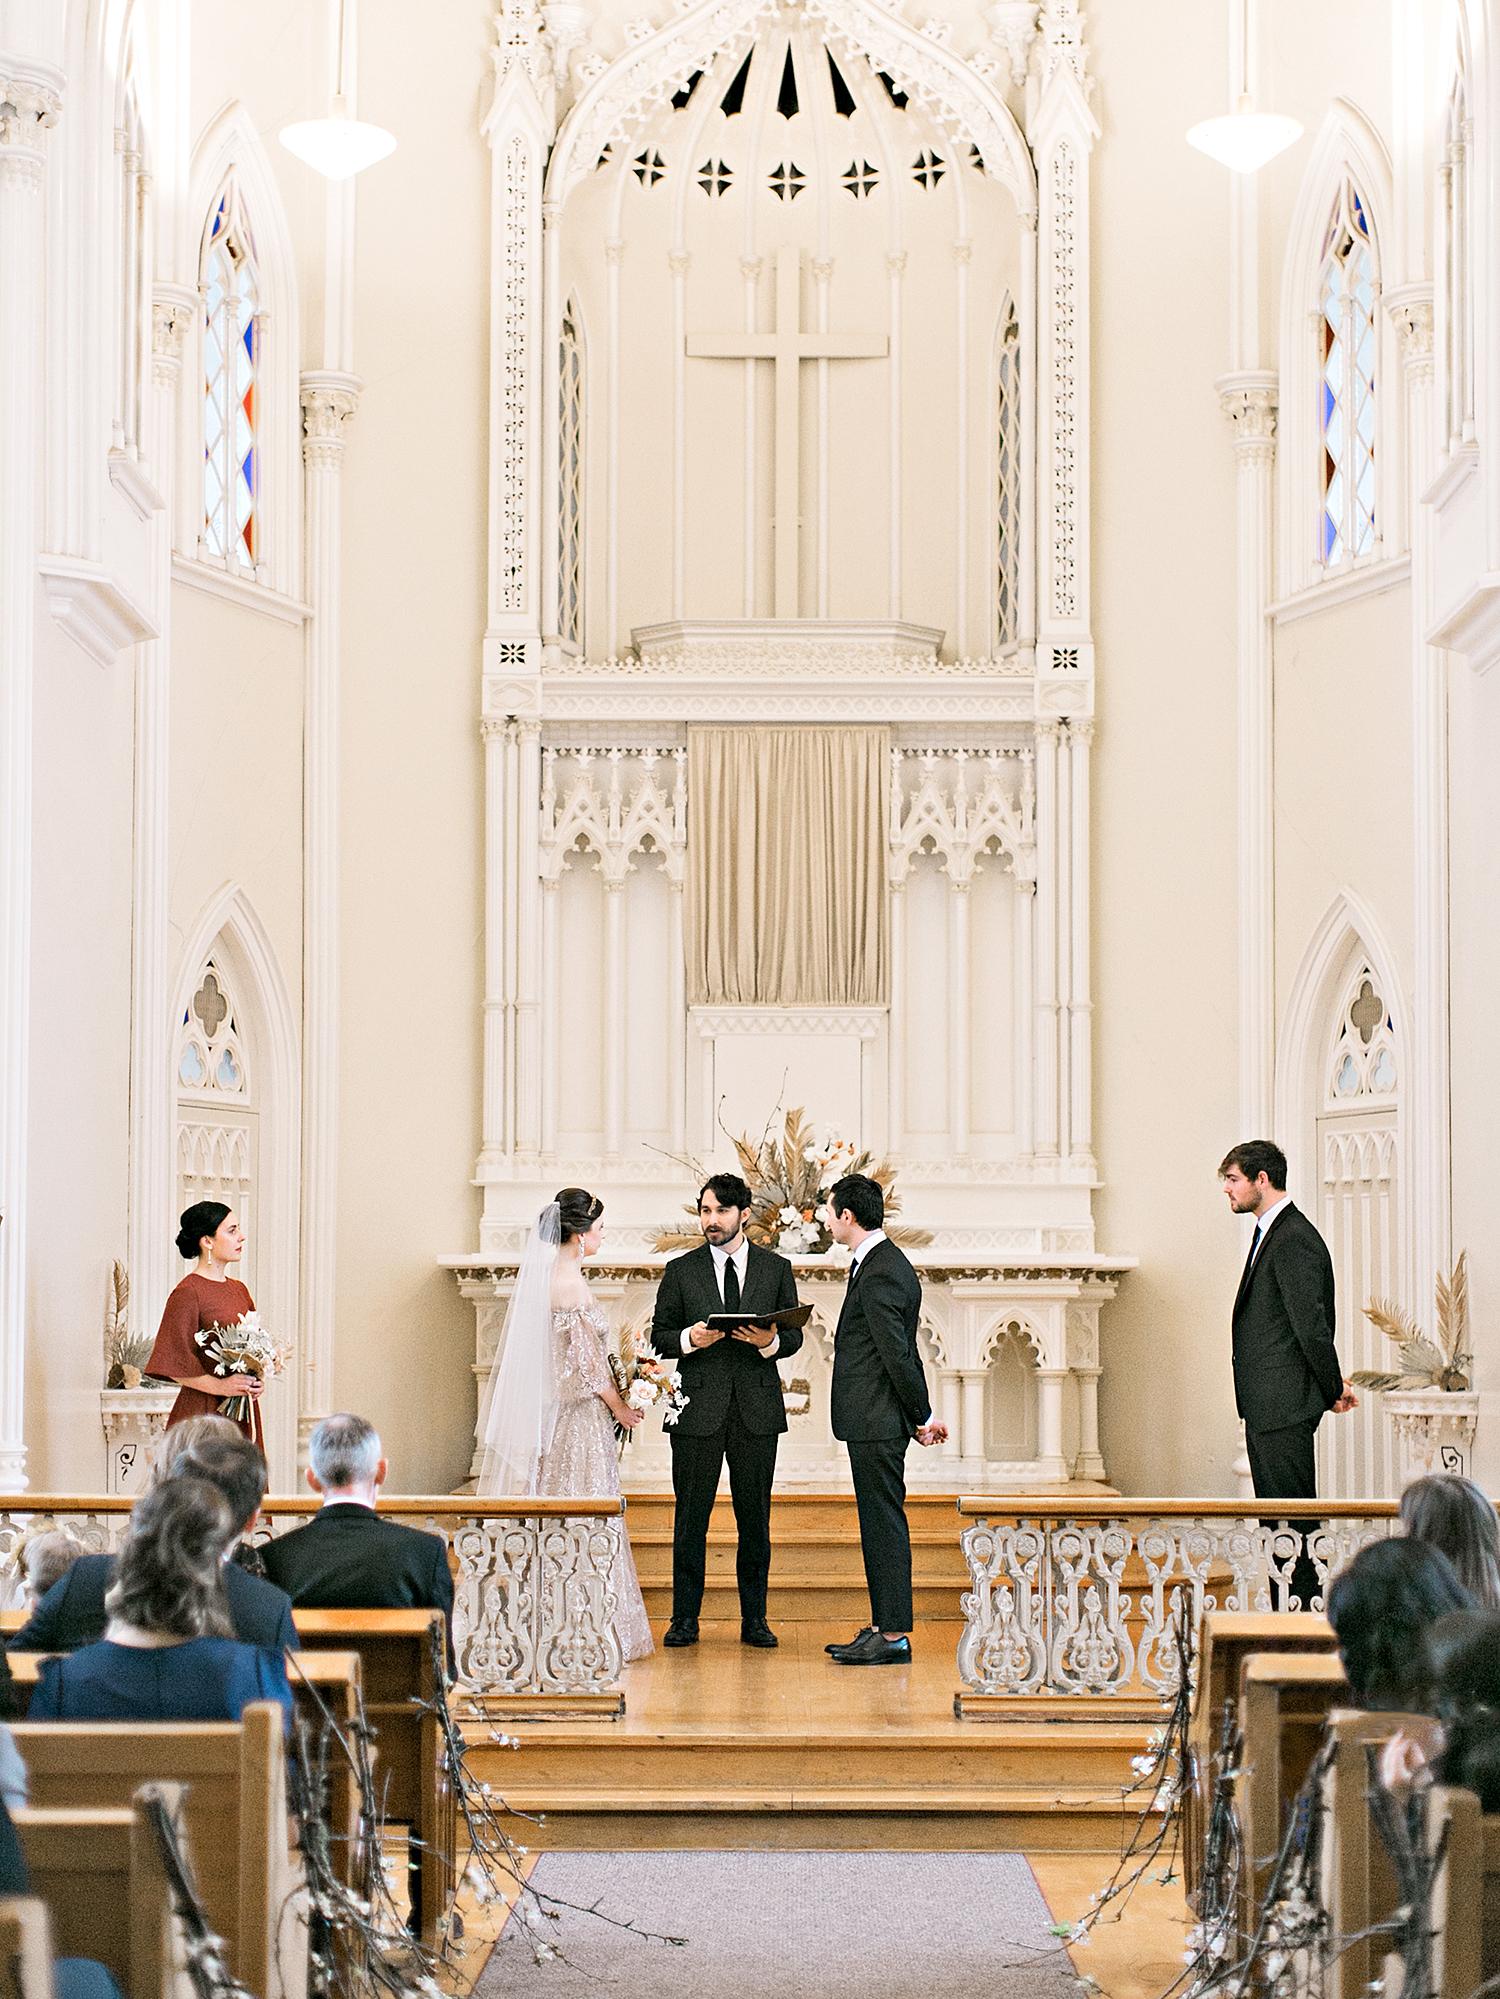 kae danny wedding ceremony